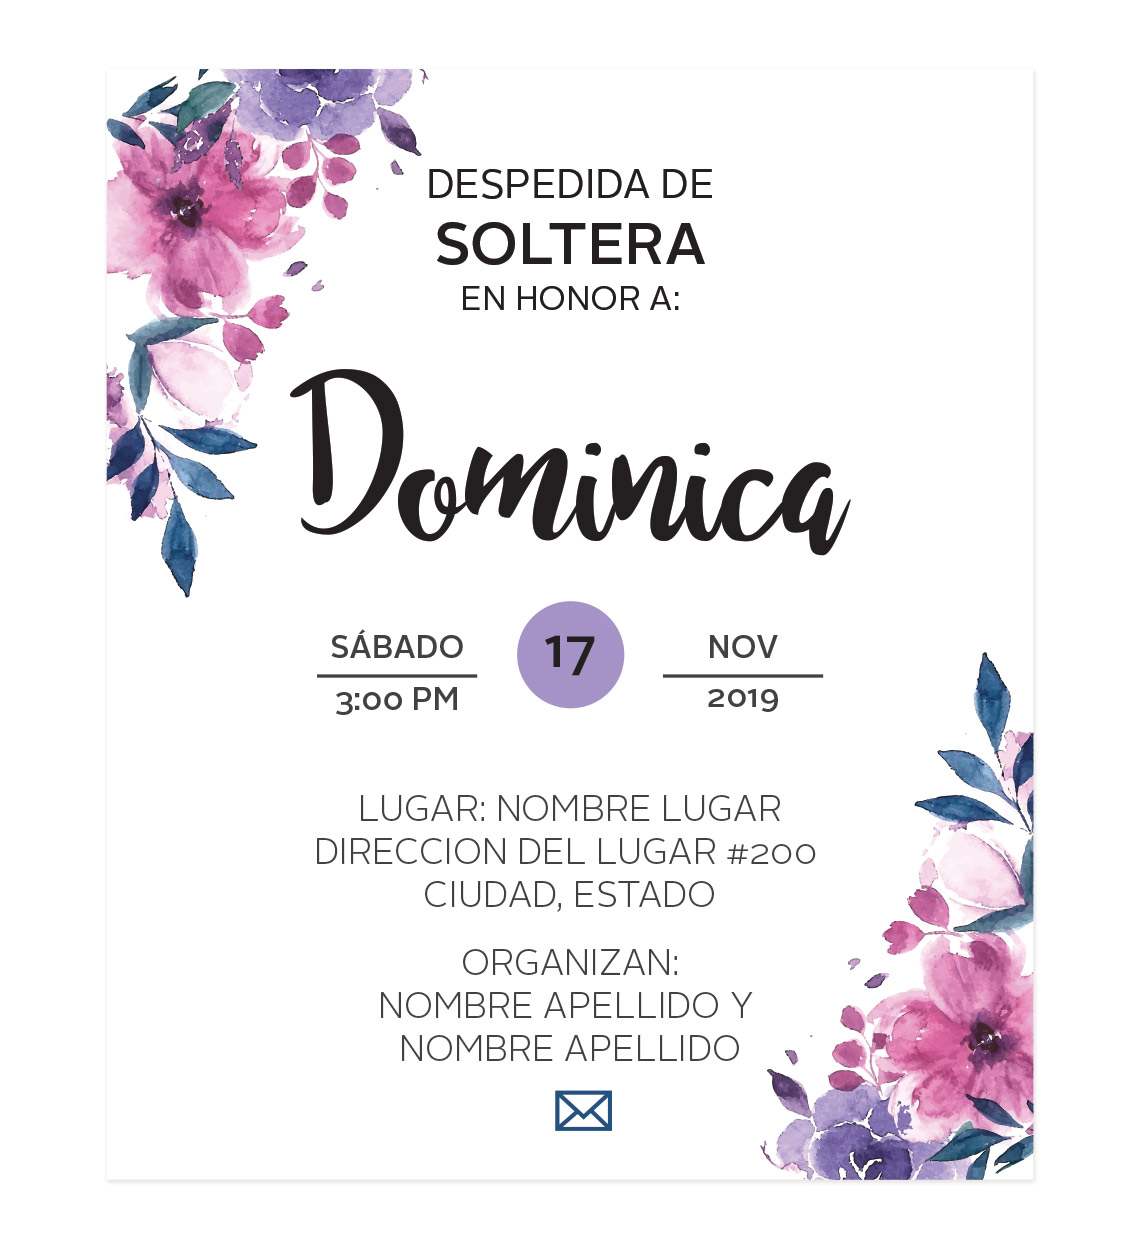 Invitacion Despedida De Soltera Flores Moradas Oh Yupi Yei